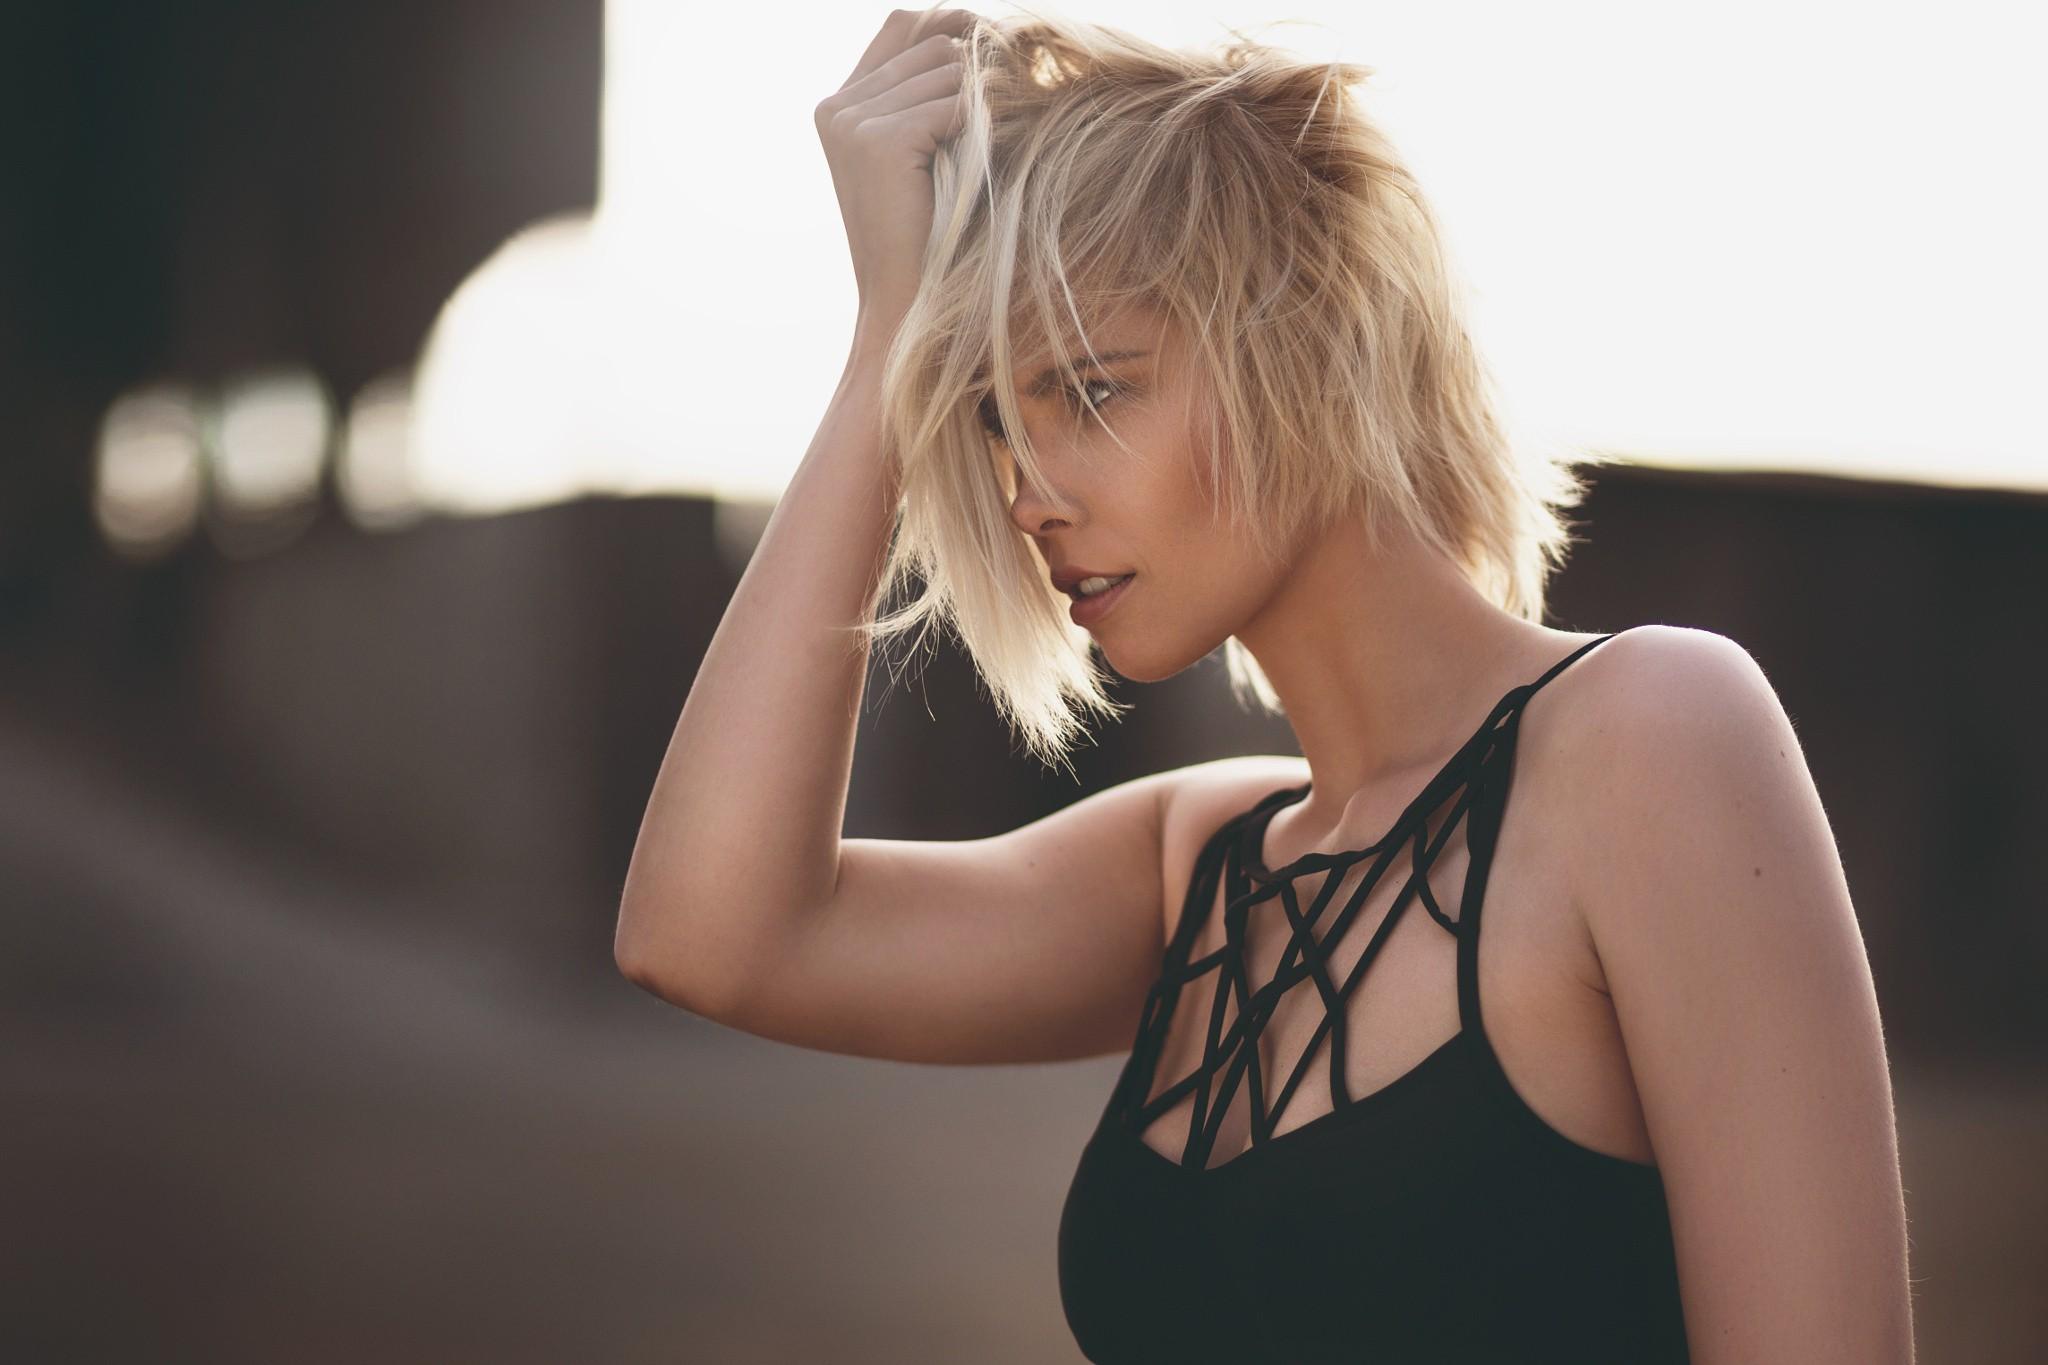 Pictures Of Alysha Nett